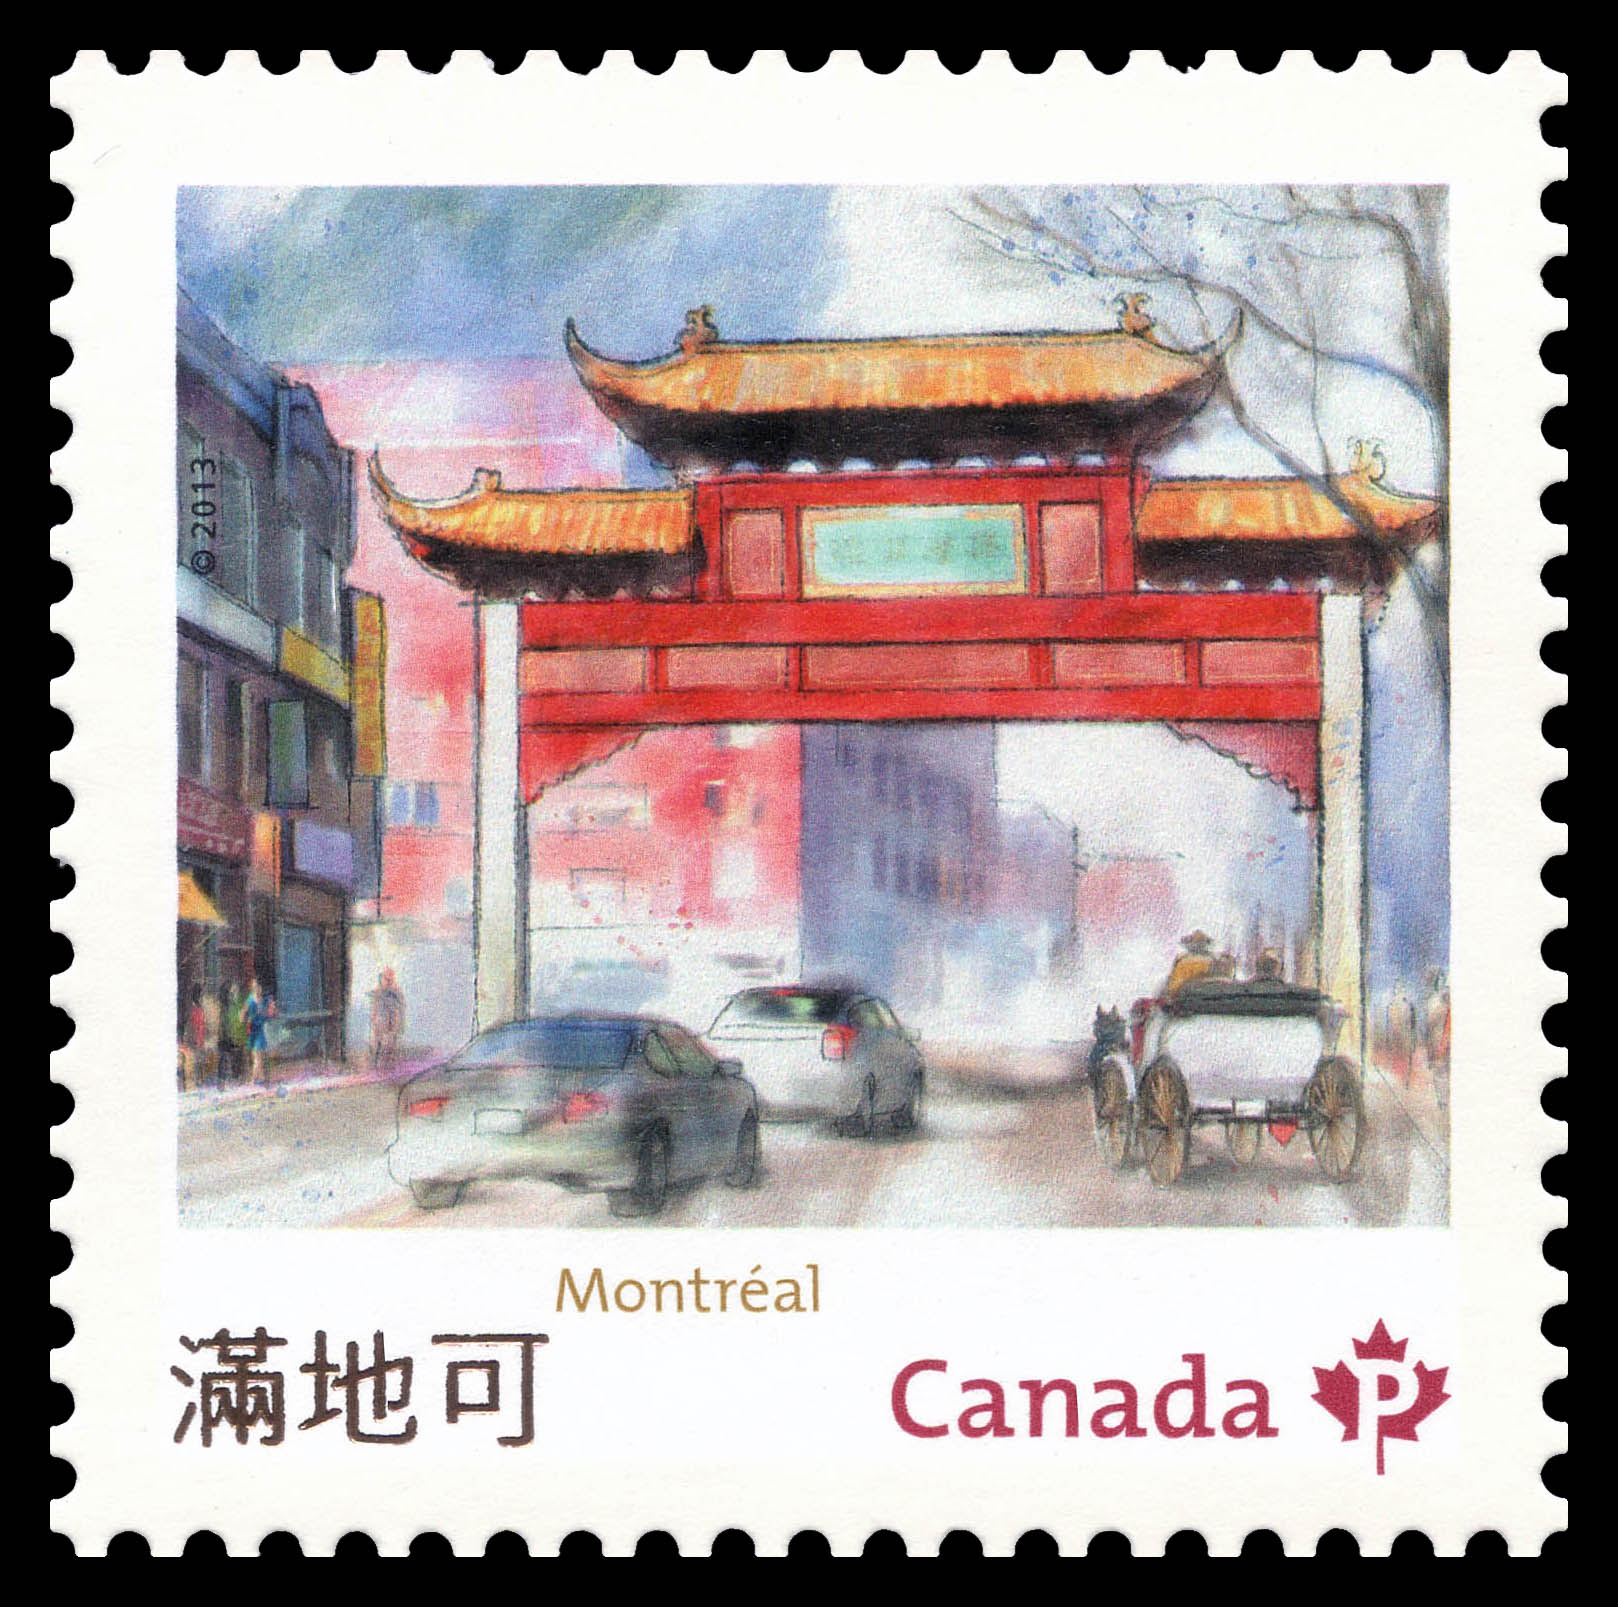 Montreal Chinatown Gate Canada Postage Stamp   Chinatown Gates